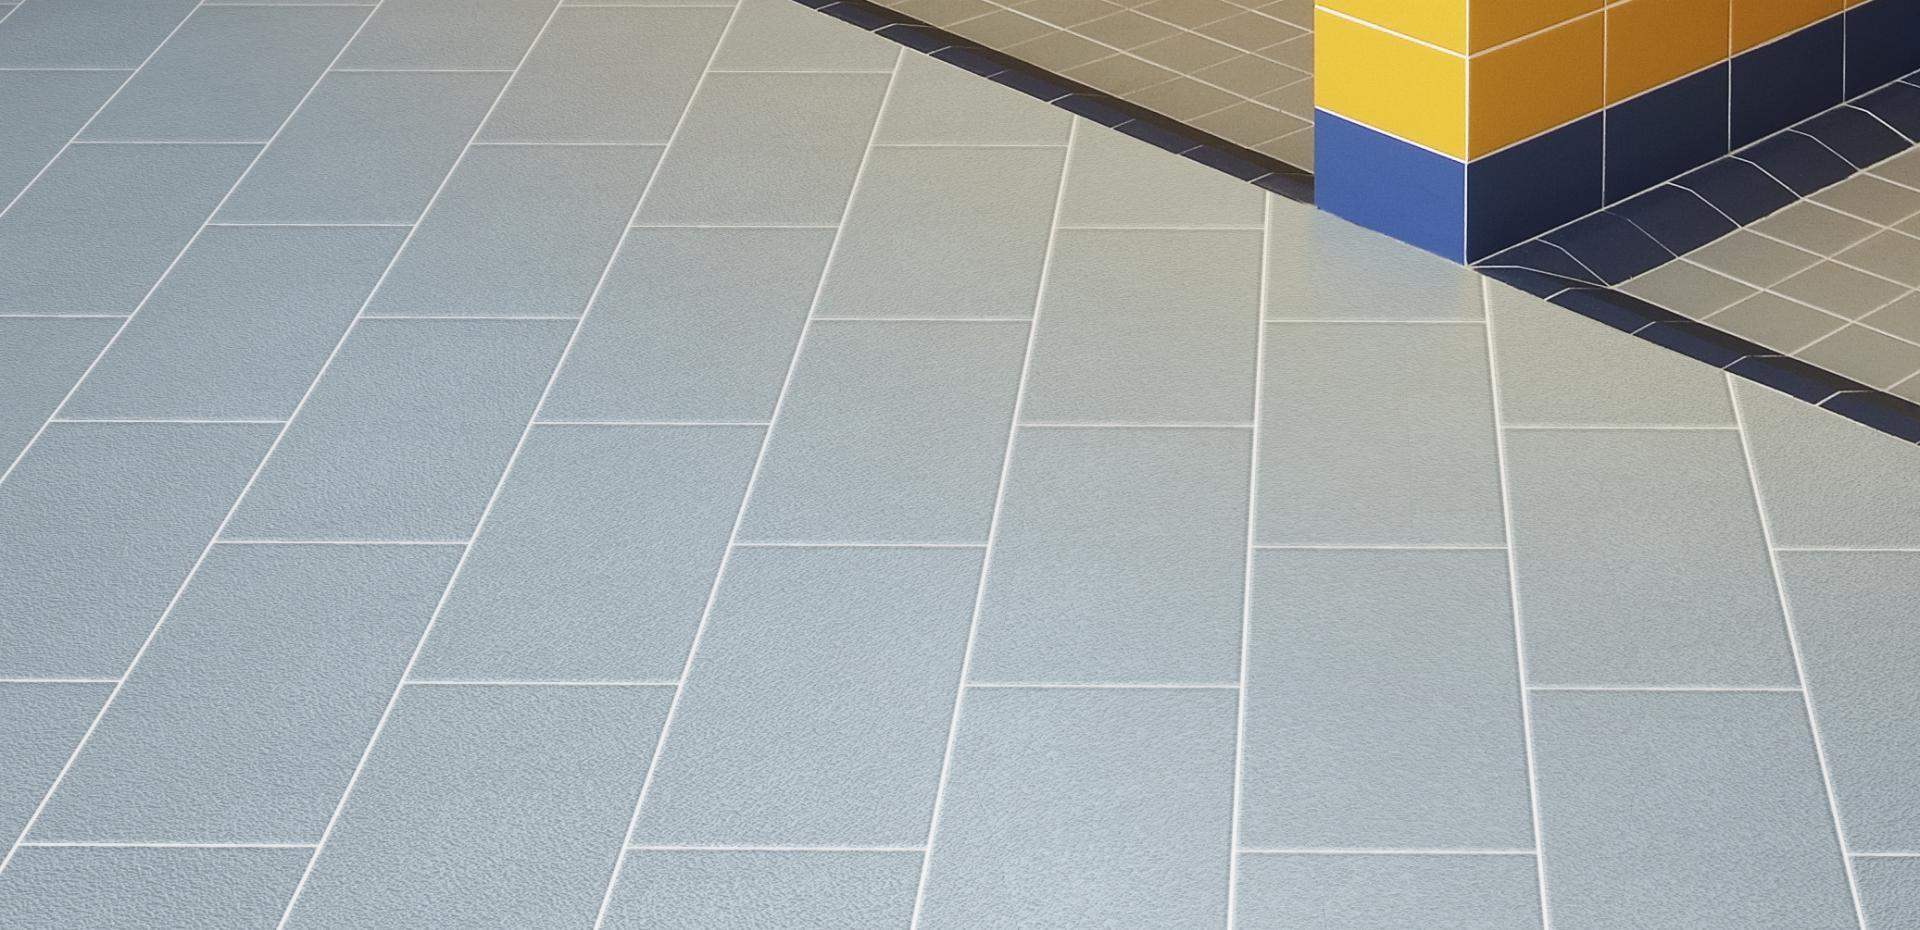 Piastrelle antiscivolo flooring r10 b a b catalogo - Piastrelle che sembrano parquet ...